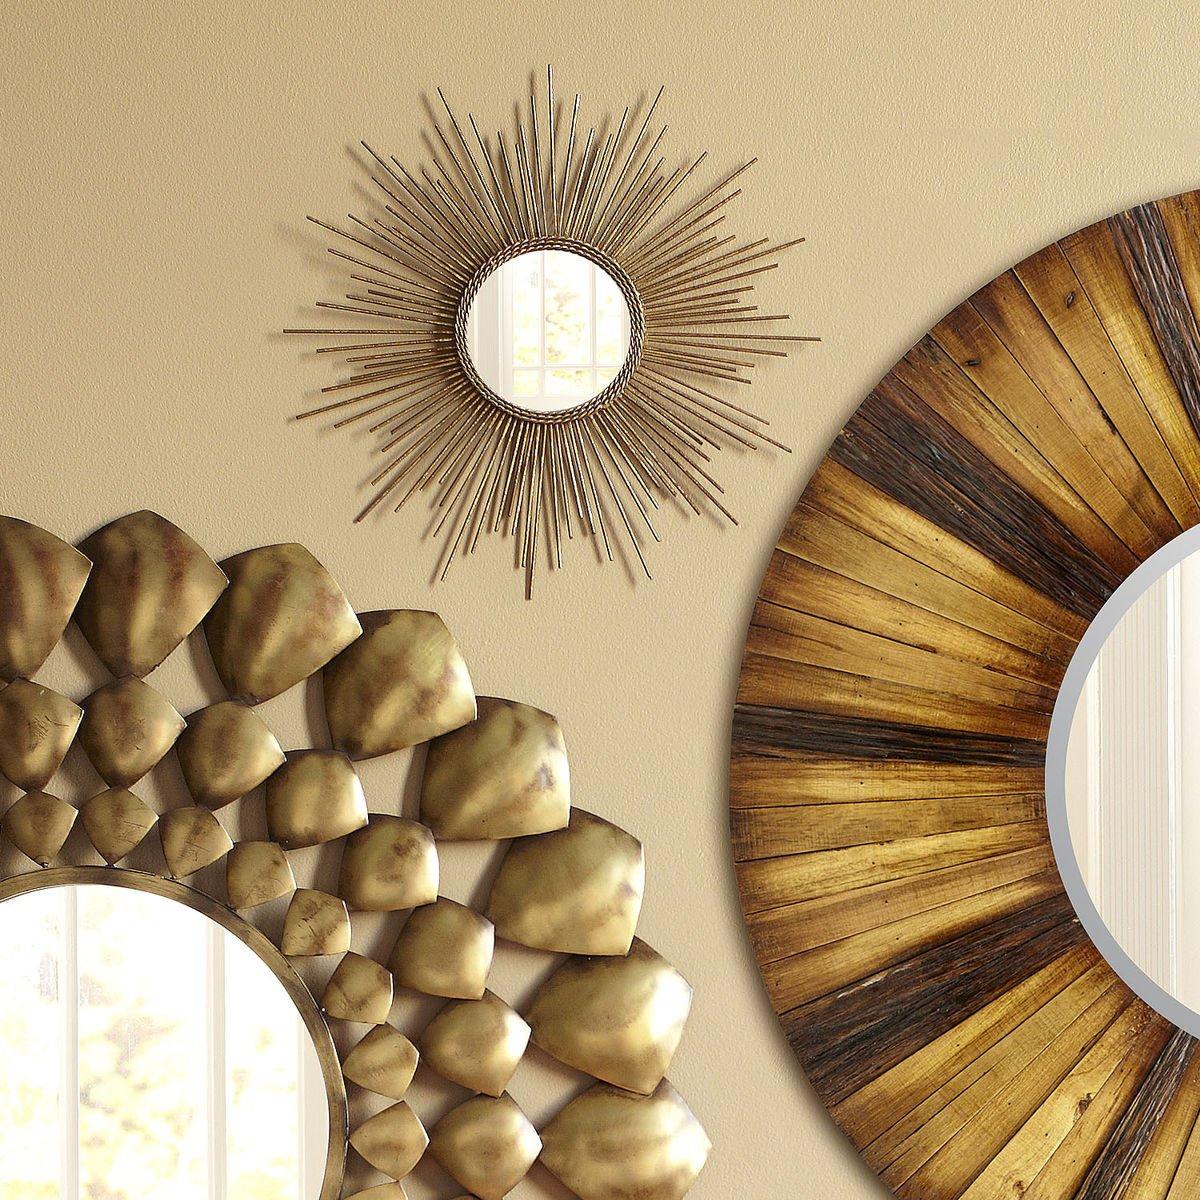 Amazon.com: Gold or Silver Sunburst Starburst Wall Mirror (Small or ...